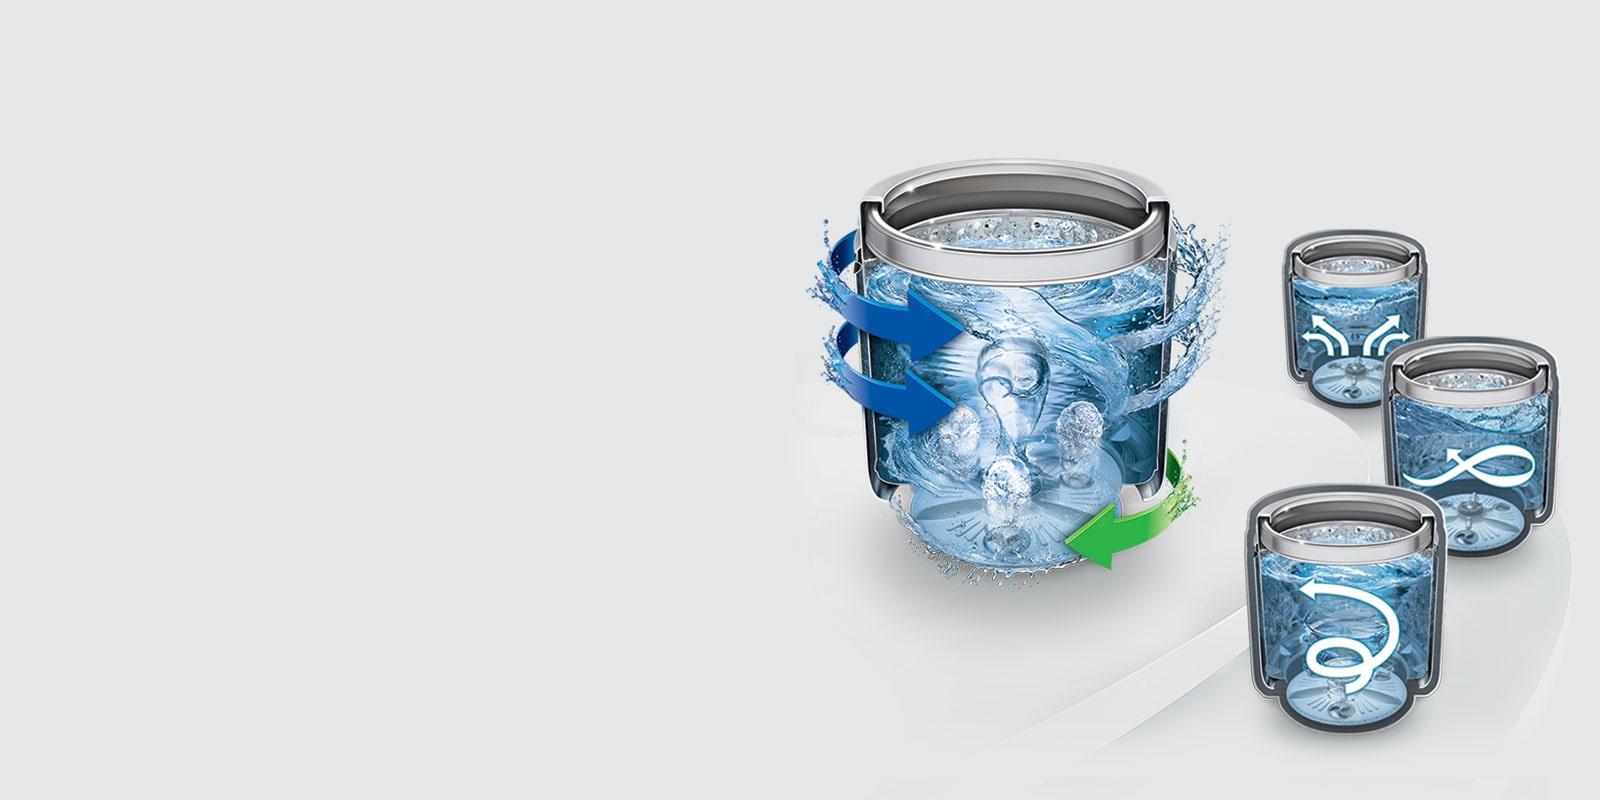 LG T65SJBK1Z 6.5 kg Smart Motion and TurboDrum